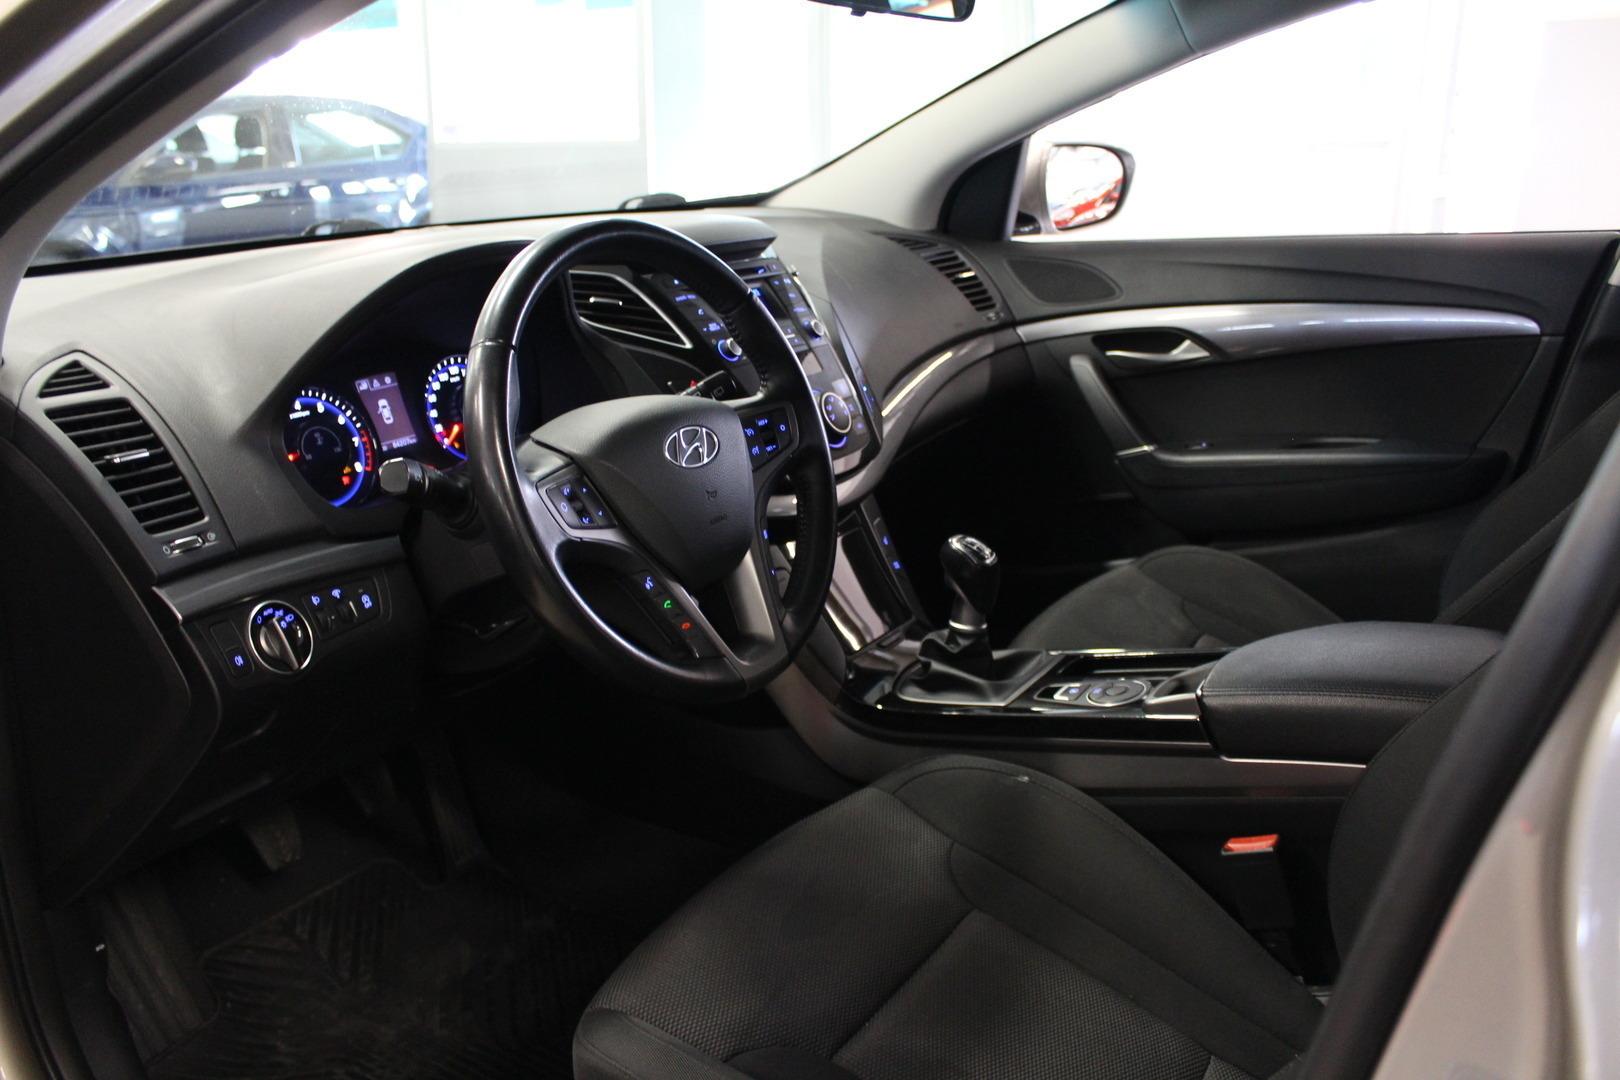 Hyundai i40 Wagon, 1,6 ISG Classic #Huippusiisti #Led-ajovalot #Kotiin toimitettuna